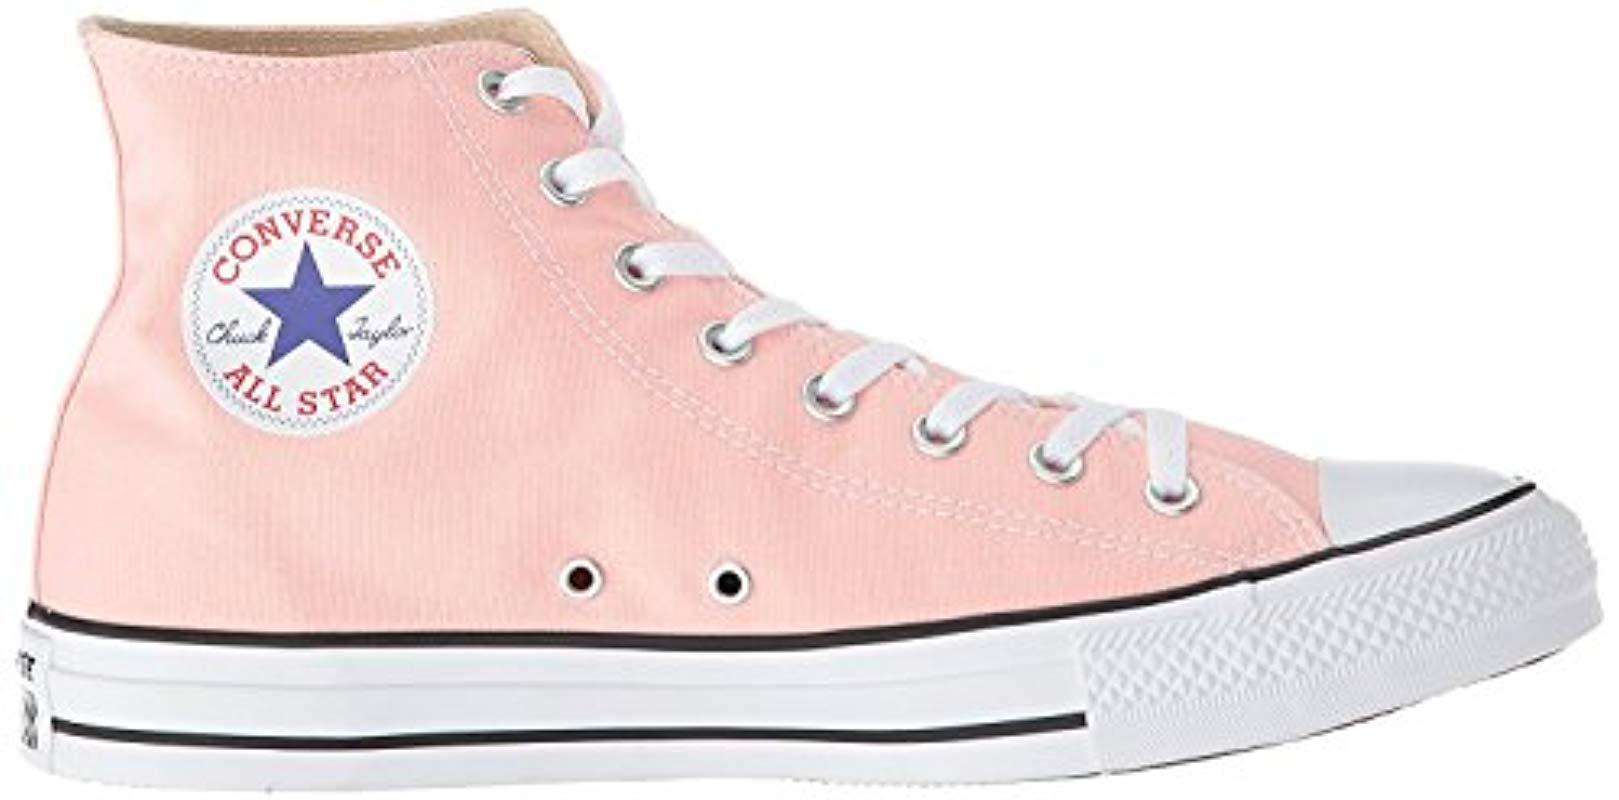 62868a74e200 Converse - Pink Chuck Taylor All Star 2018 Seasonal High Top Sneaker -  Lyst. View fullscreen